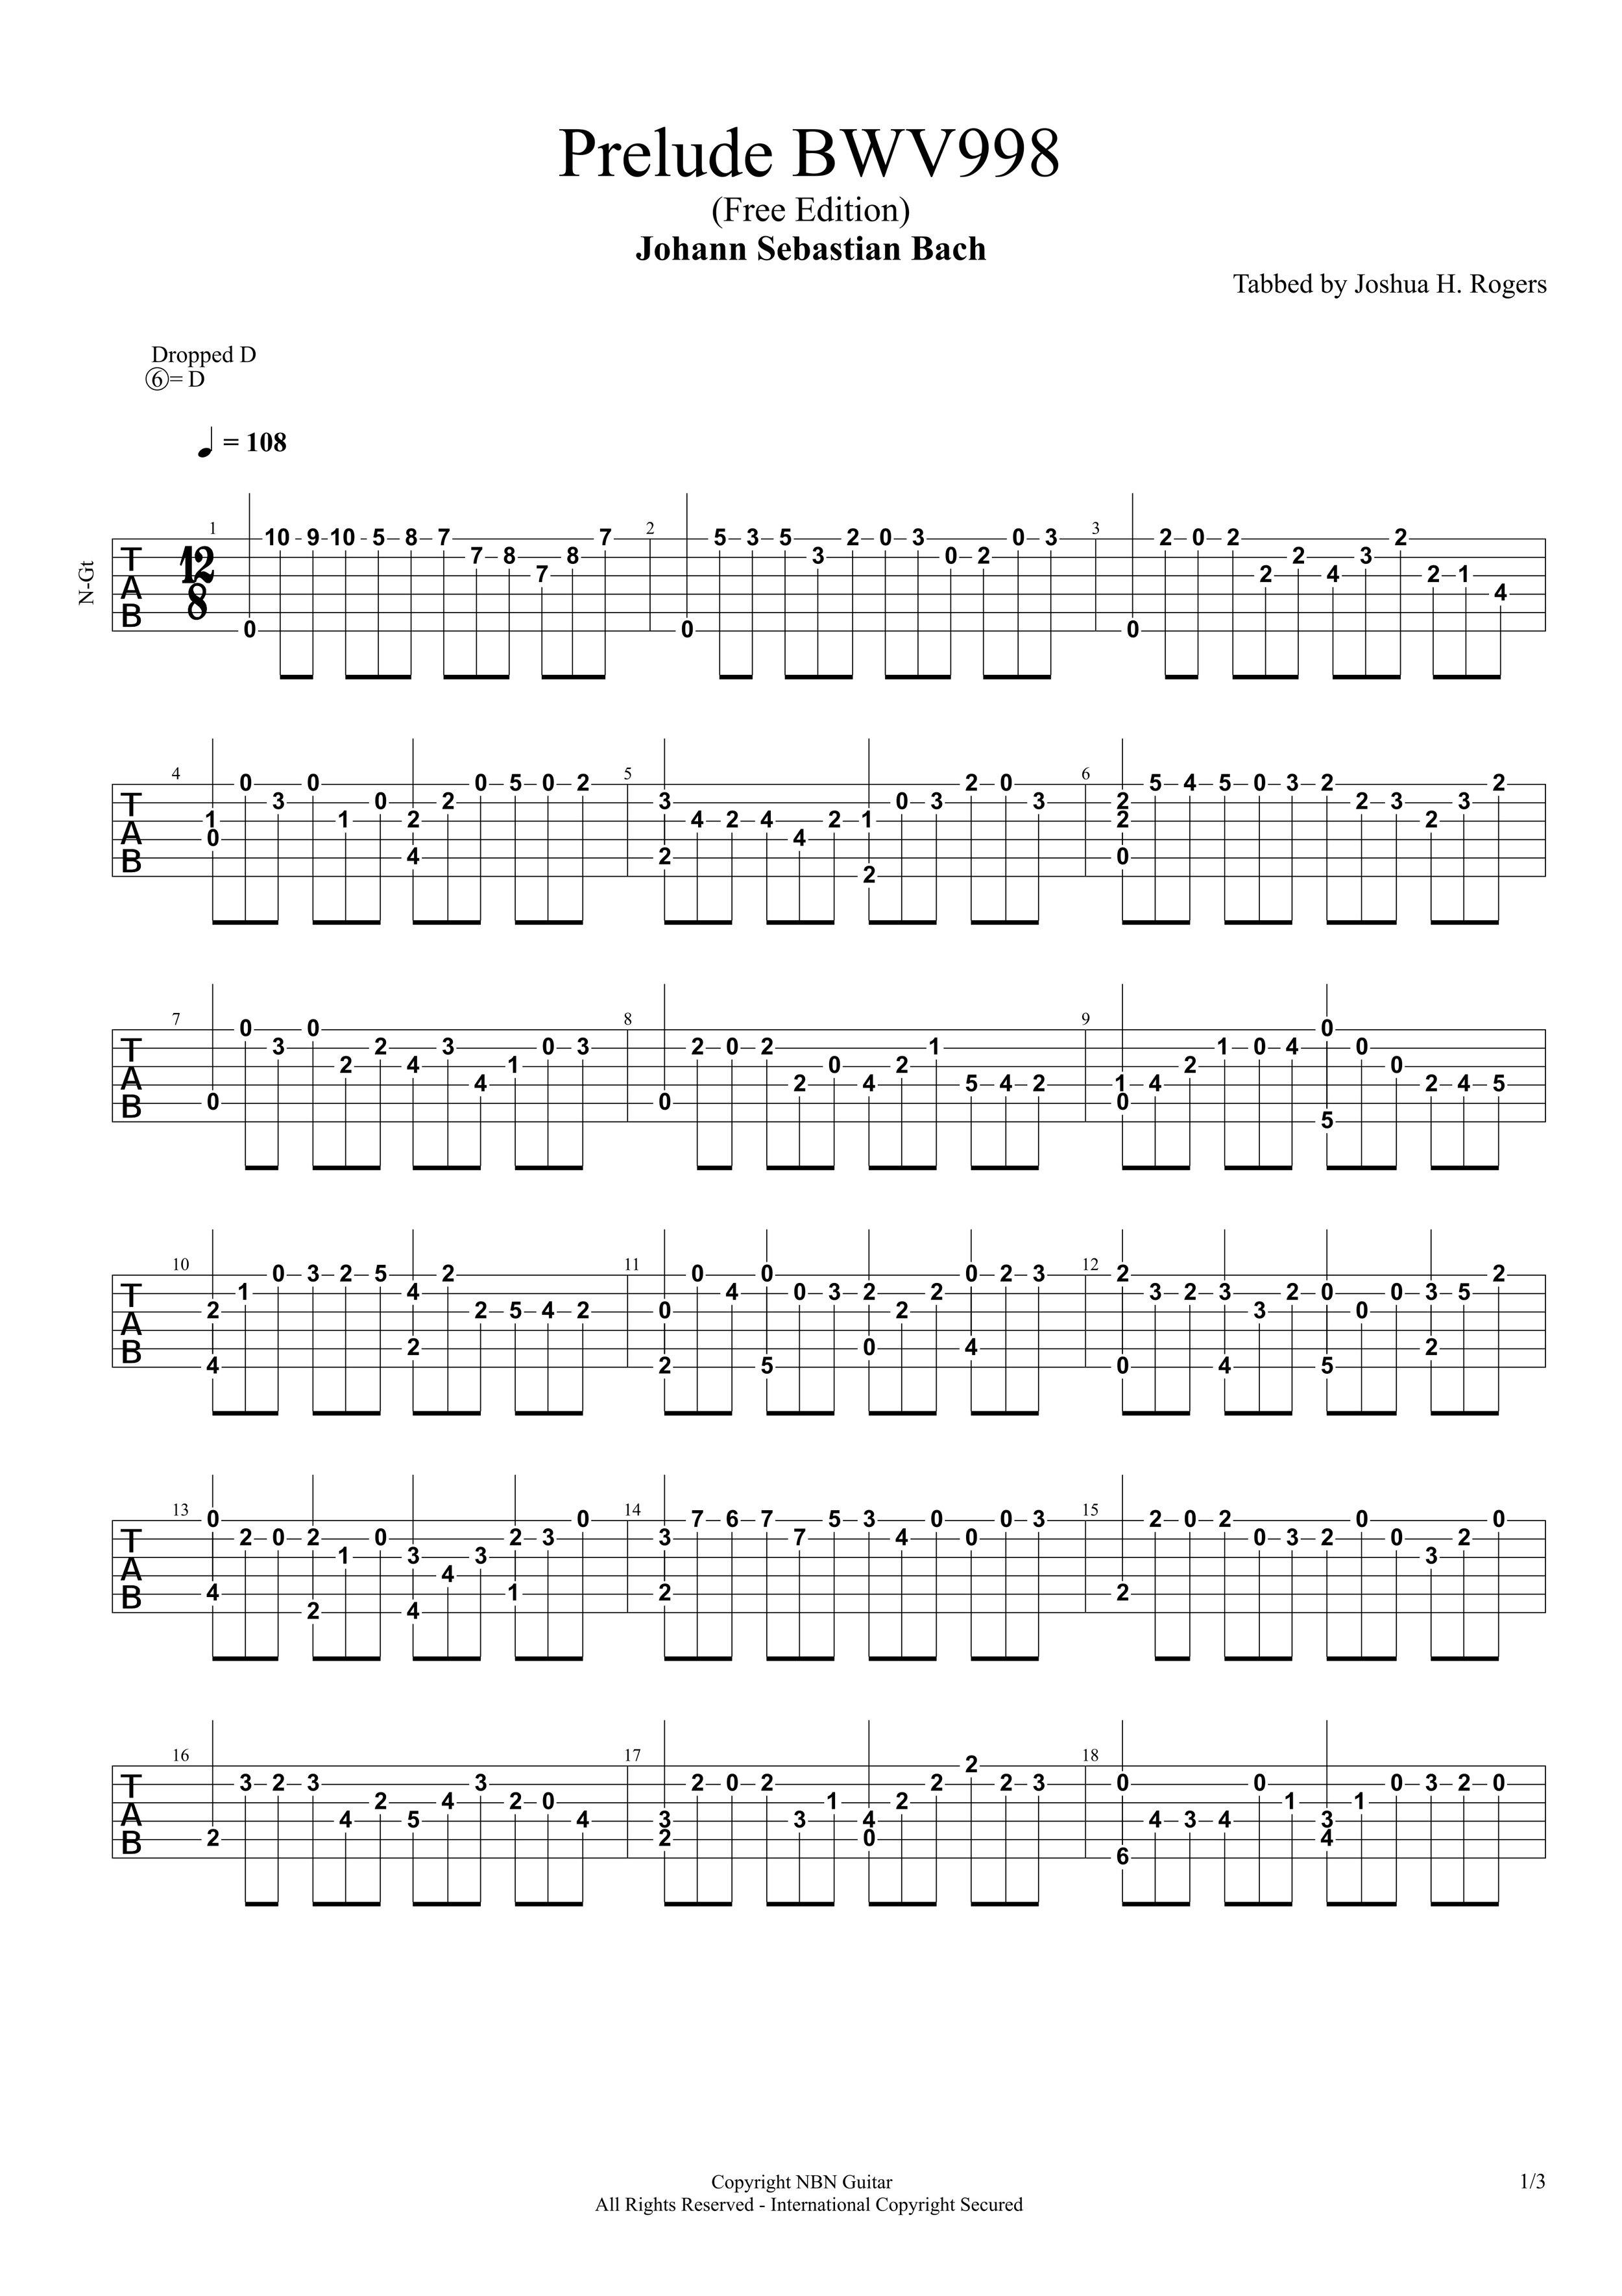 Prelude BWV 998 (Tabs)-p3.jpg